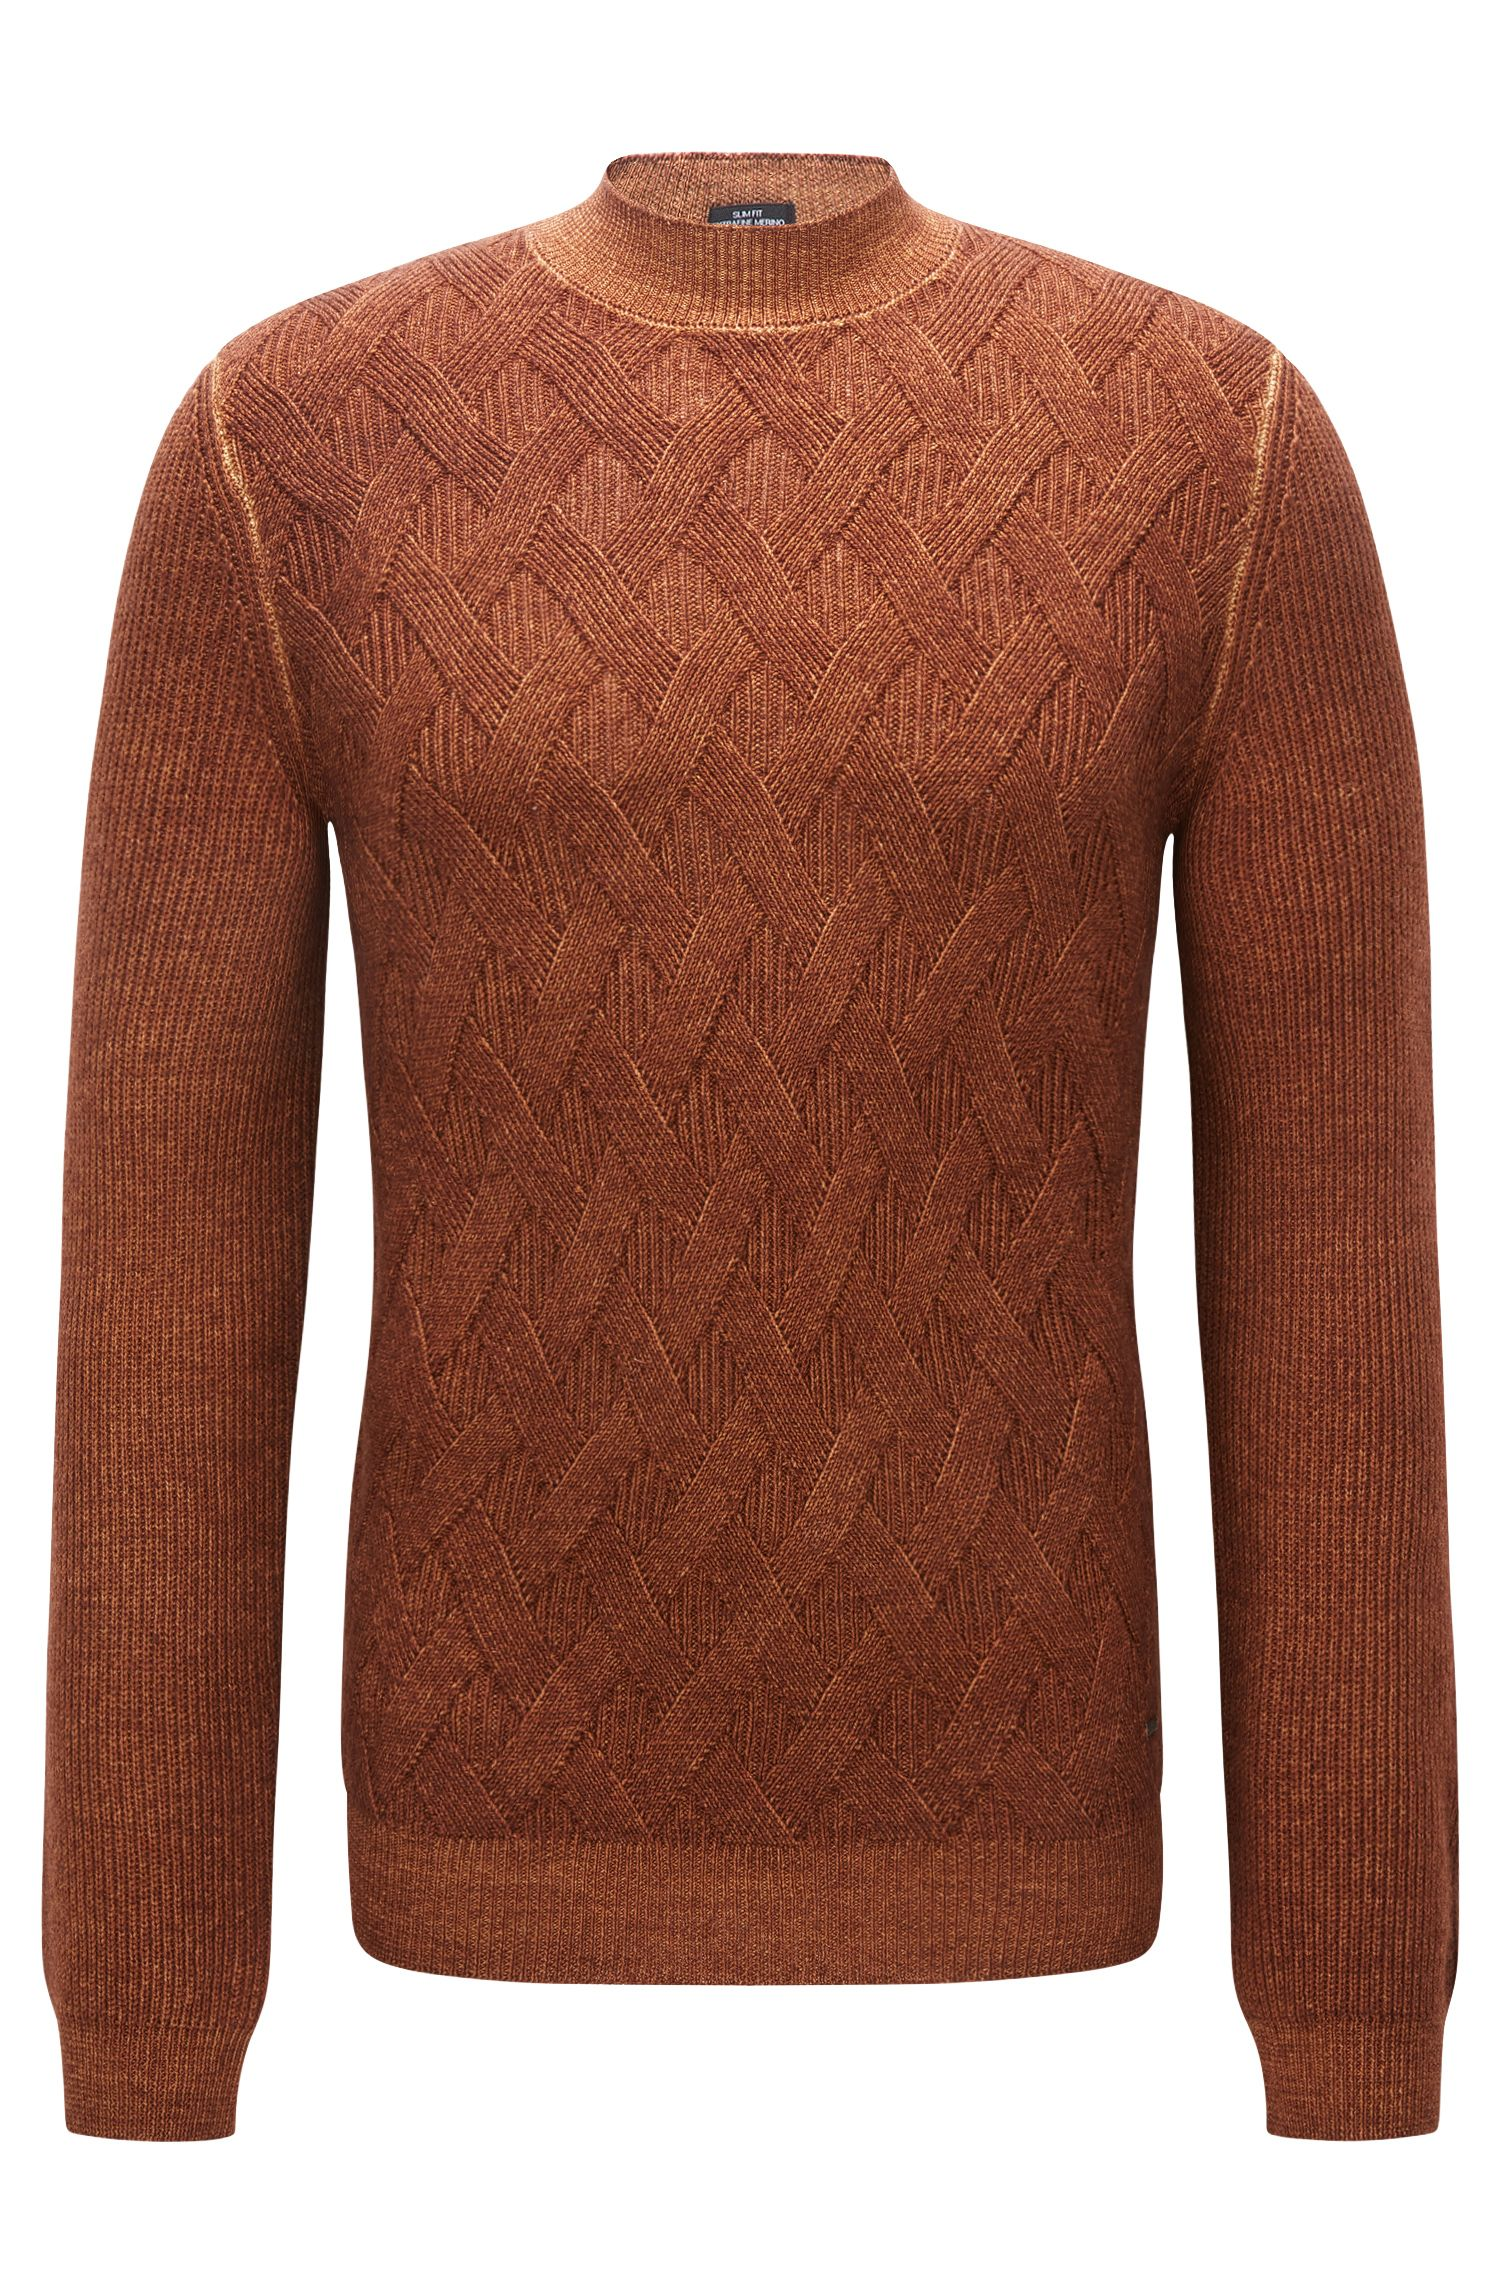 'Nicaro' | Cable Knit Merino Wool Sweater